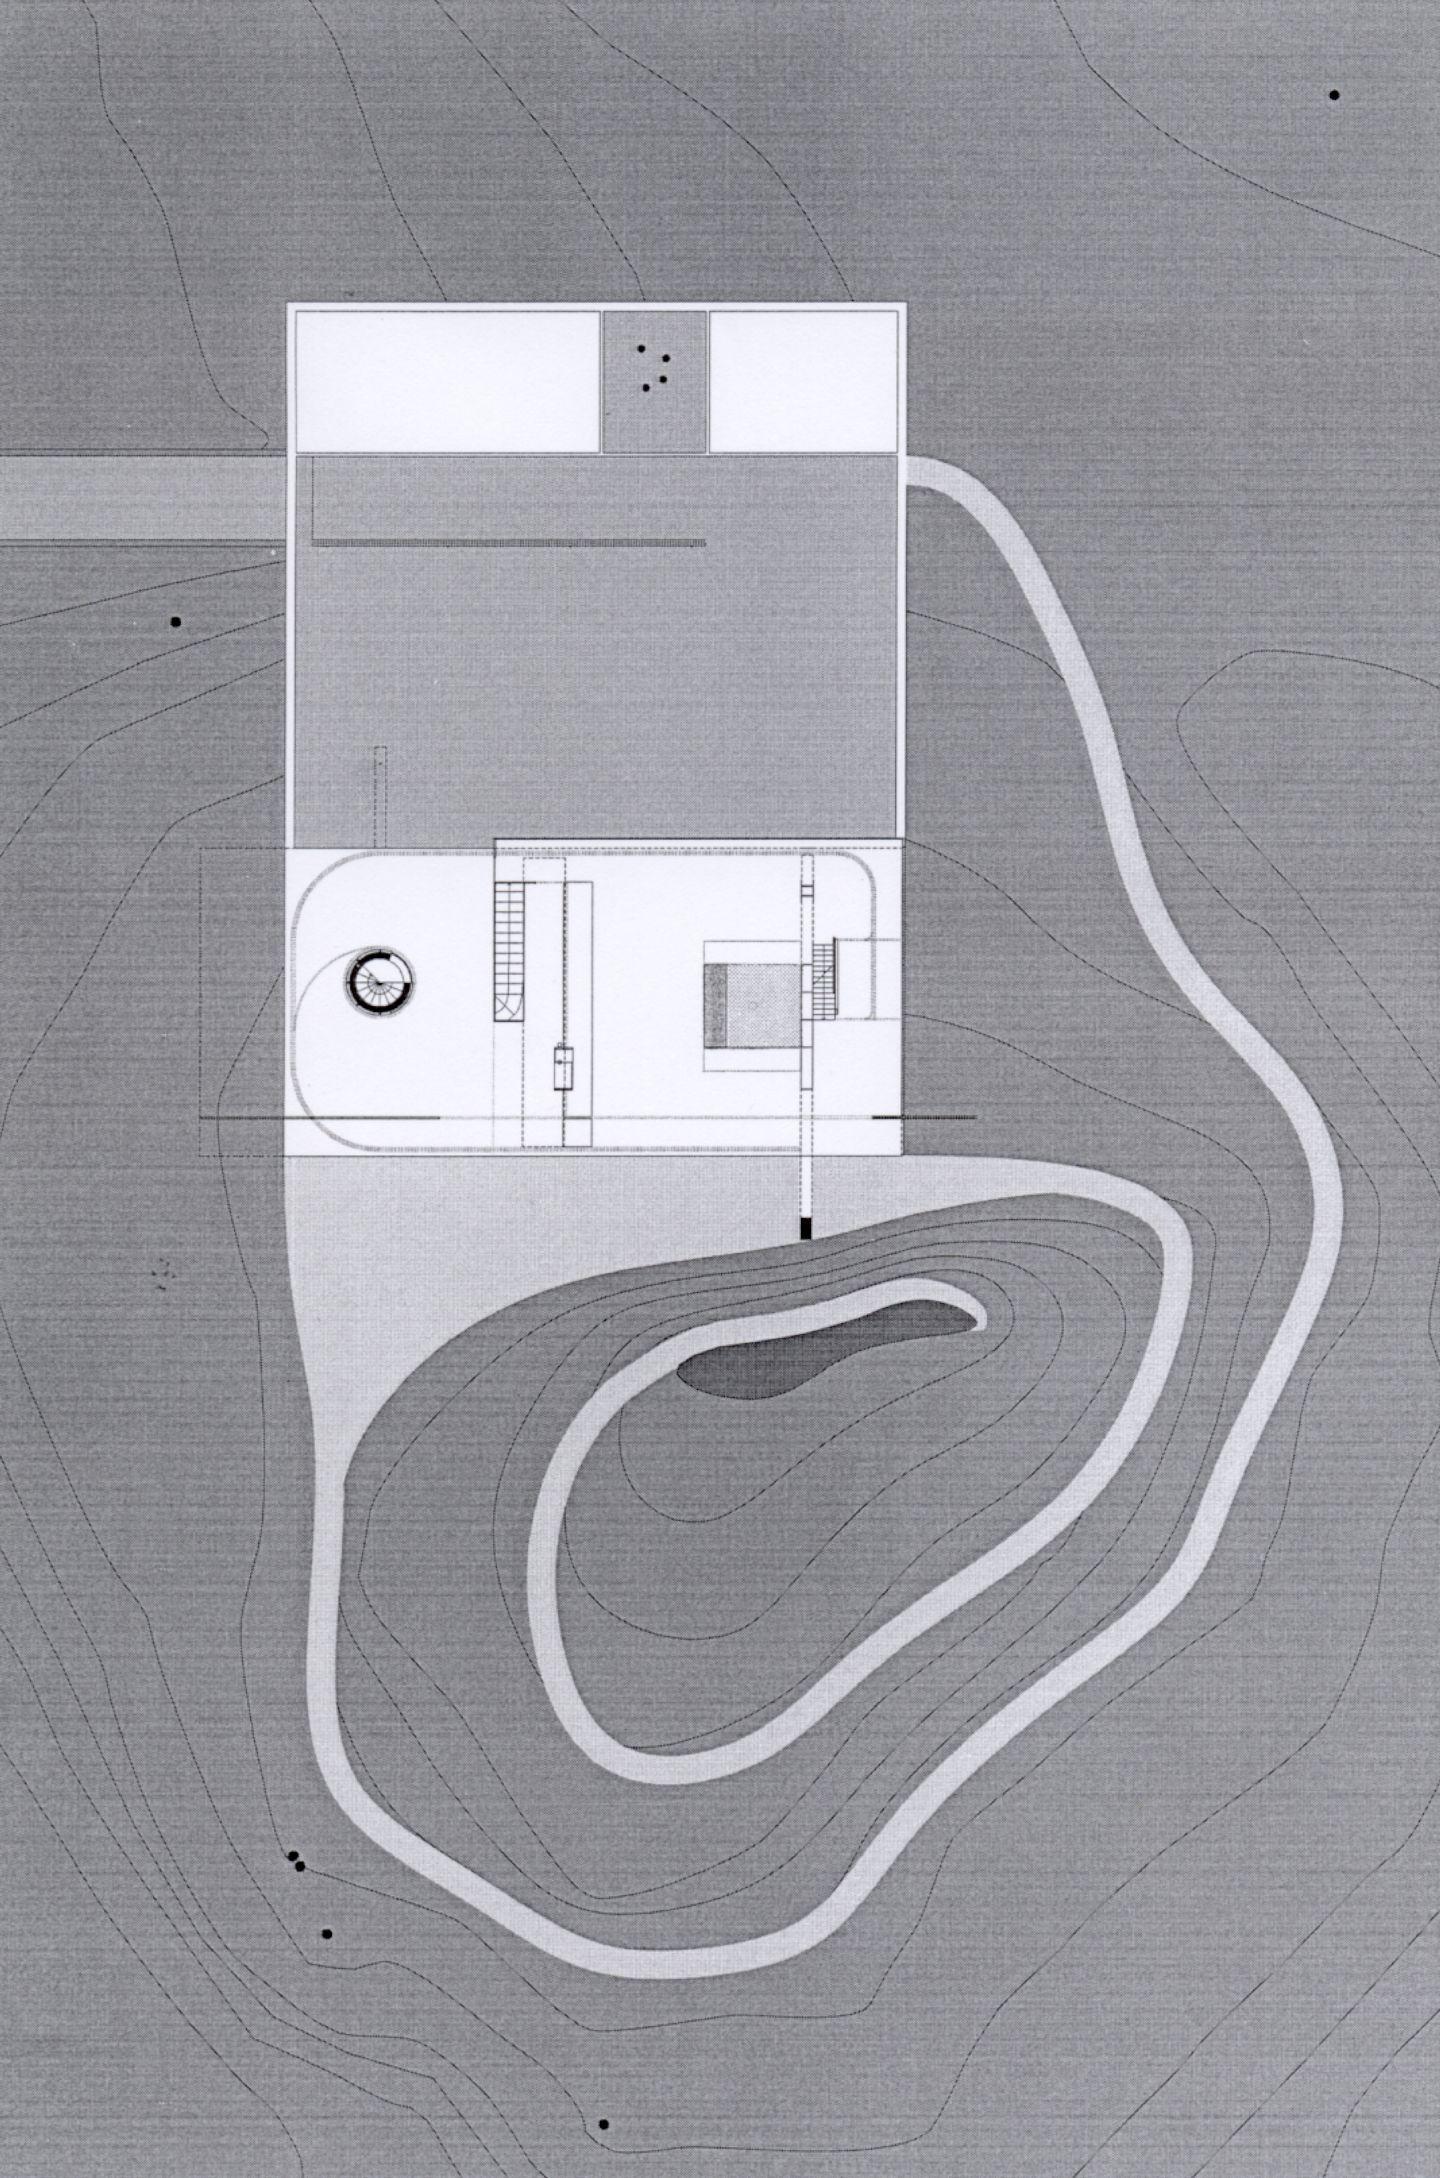 Rem koolhaas villa dall ava paris france 1991 atlas of - Oma Office Of Metropolitan Architecture Maison Bordeaux Divisare Rem Koolhaastechnical